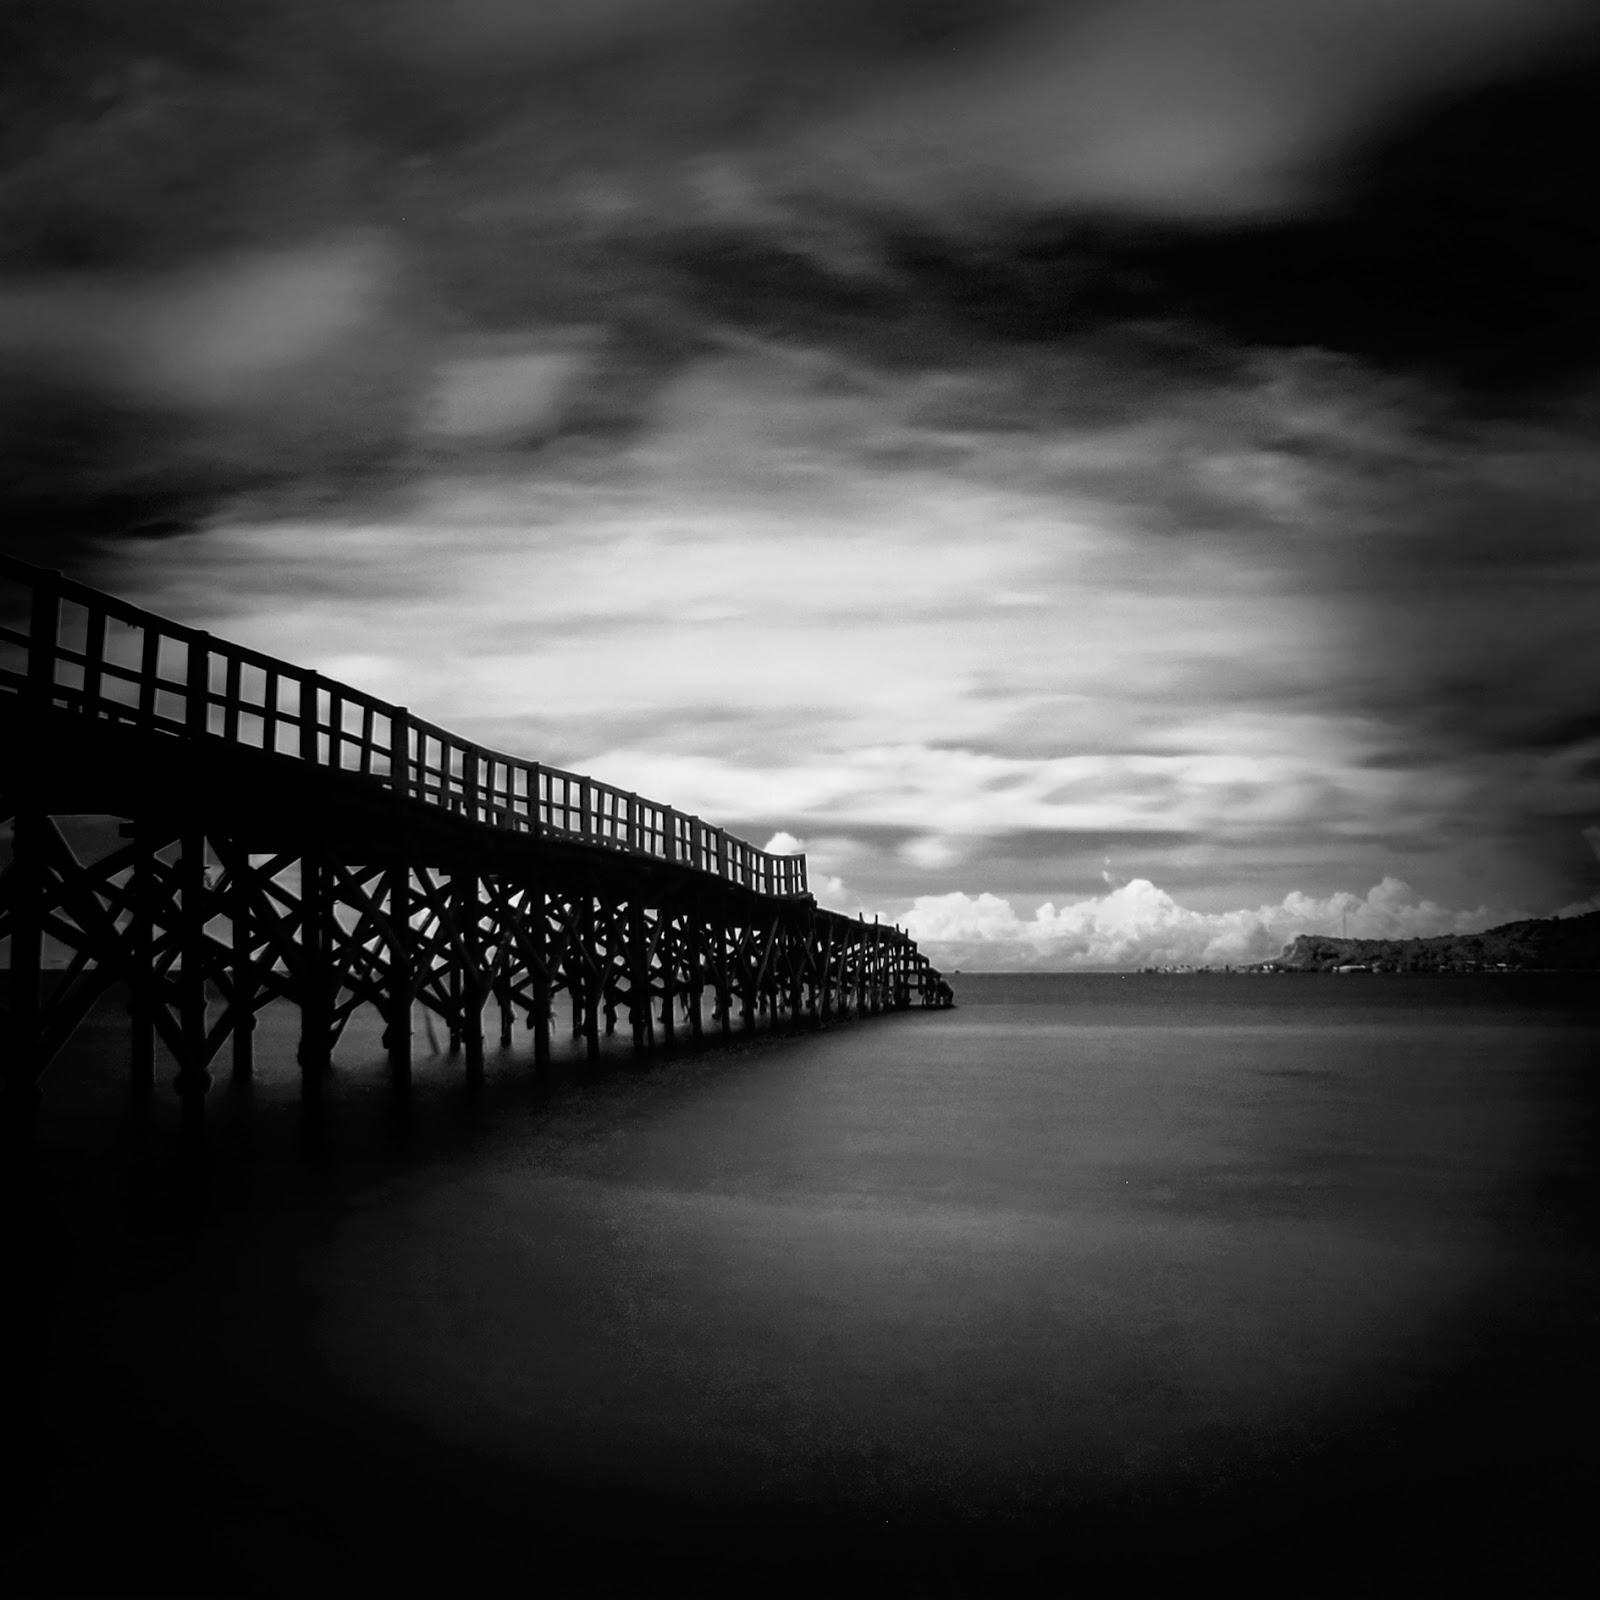 exotism bridge